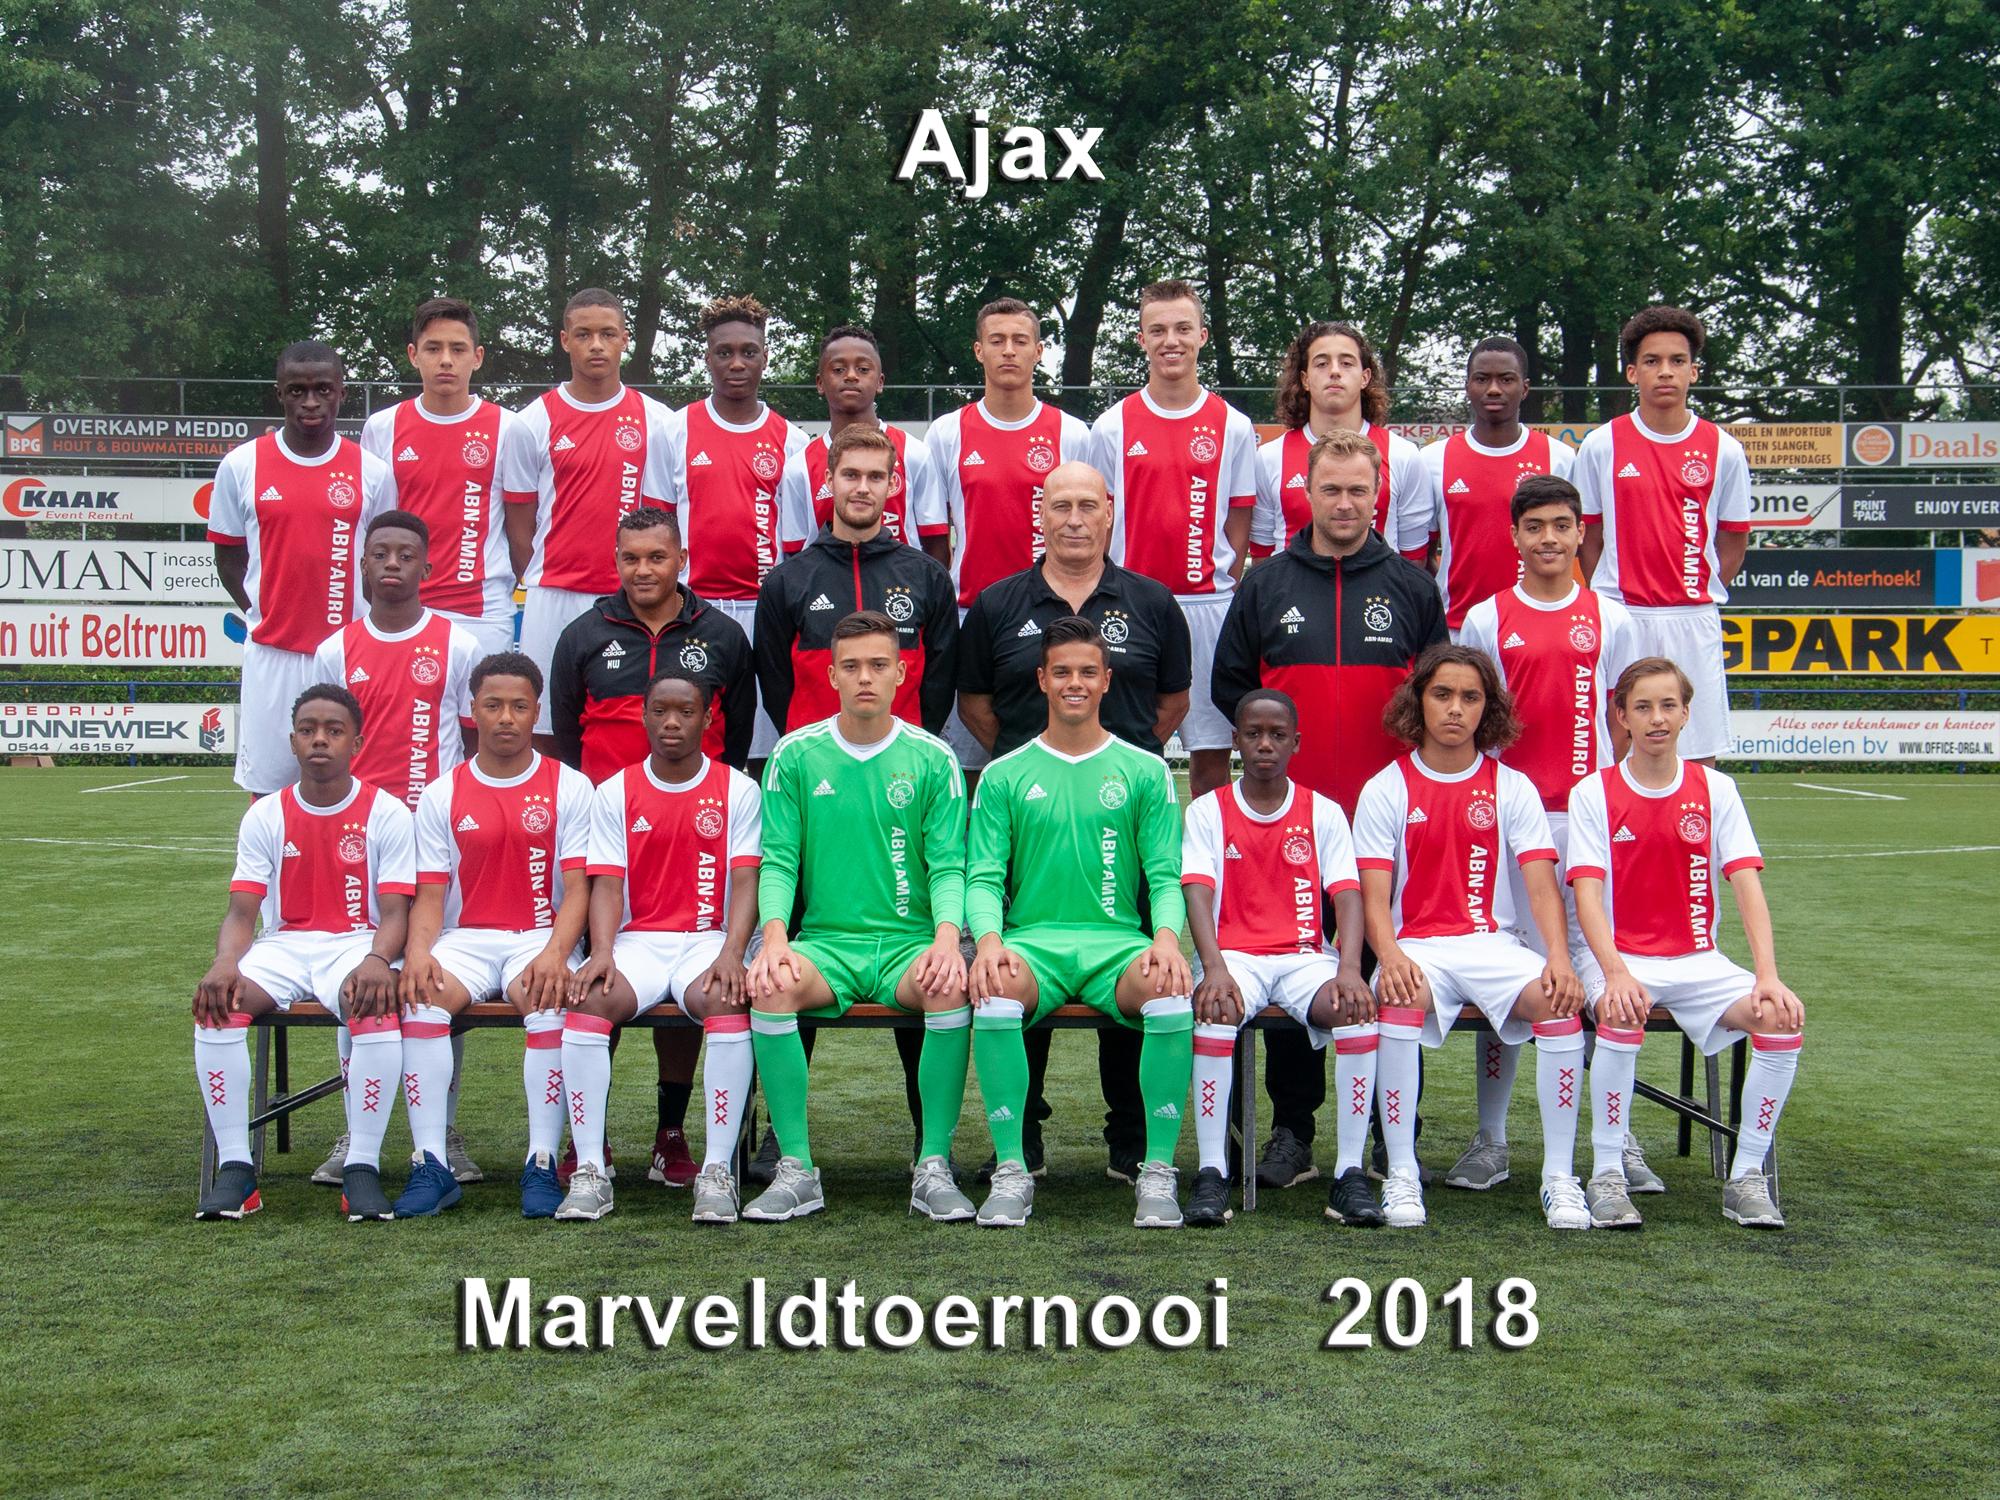 Marveld Tournament 2018 - Ajax